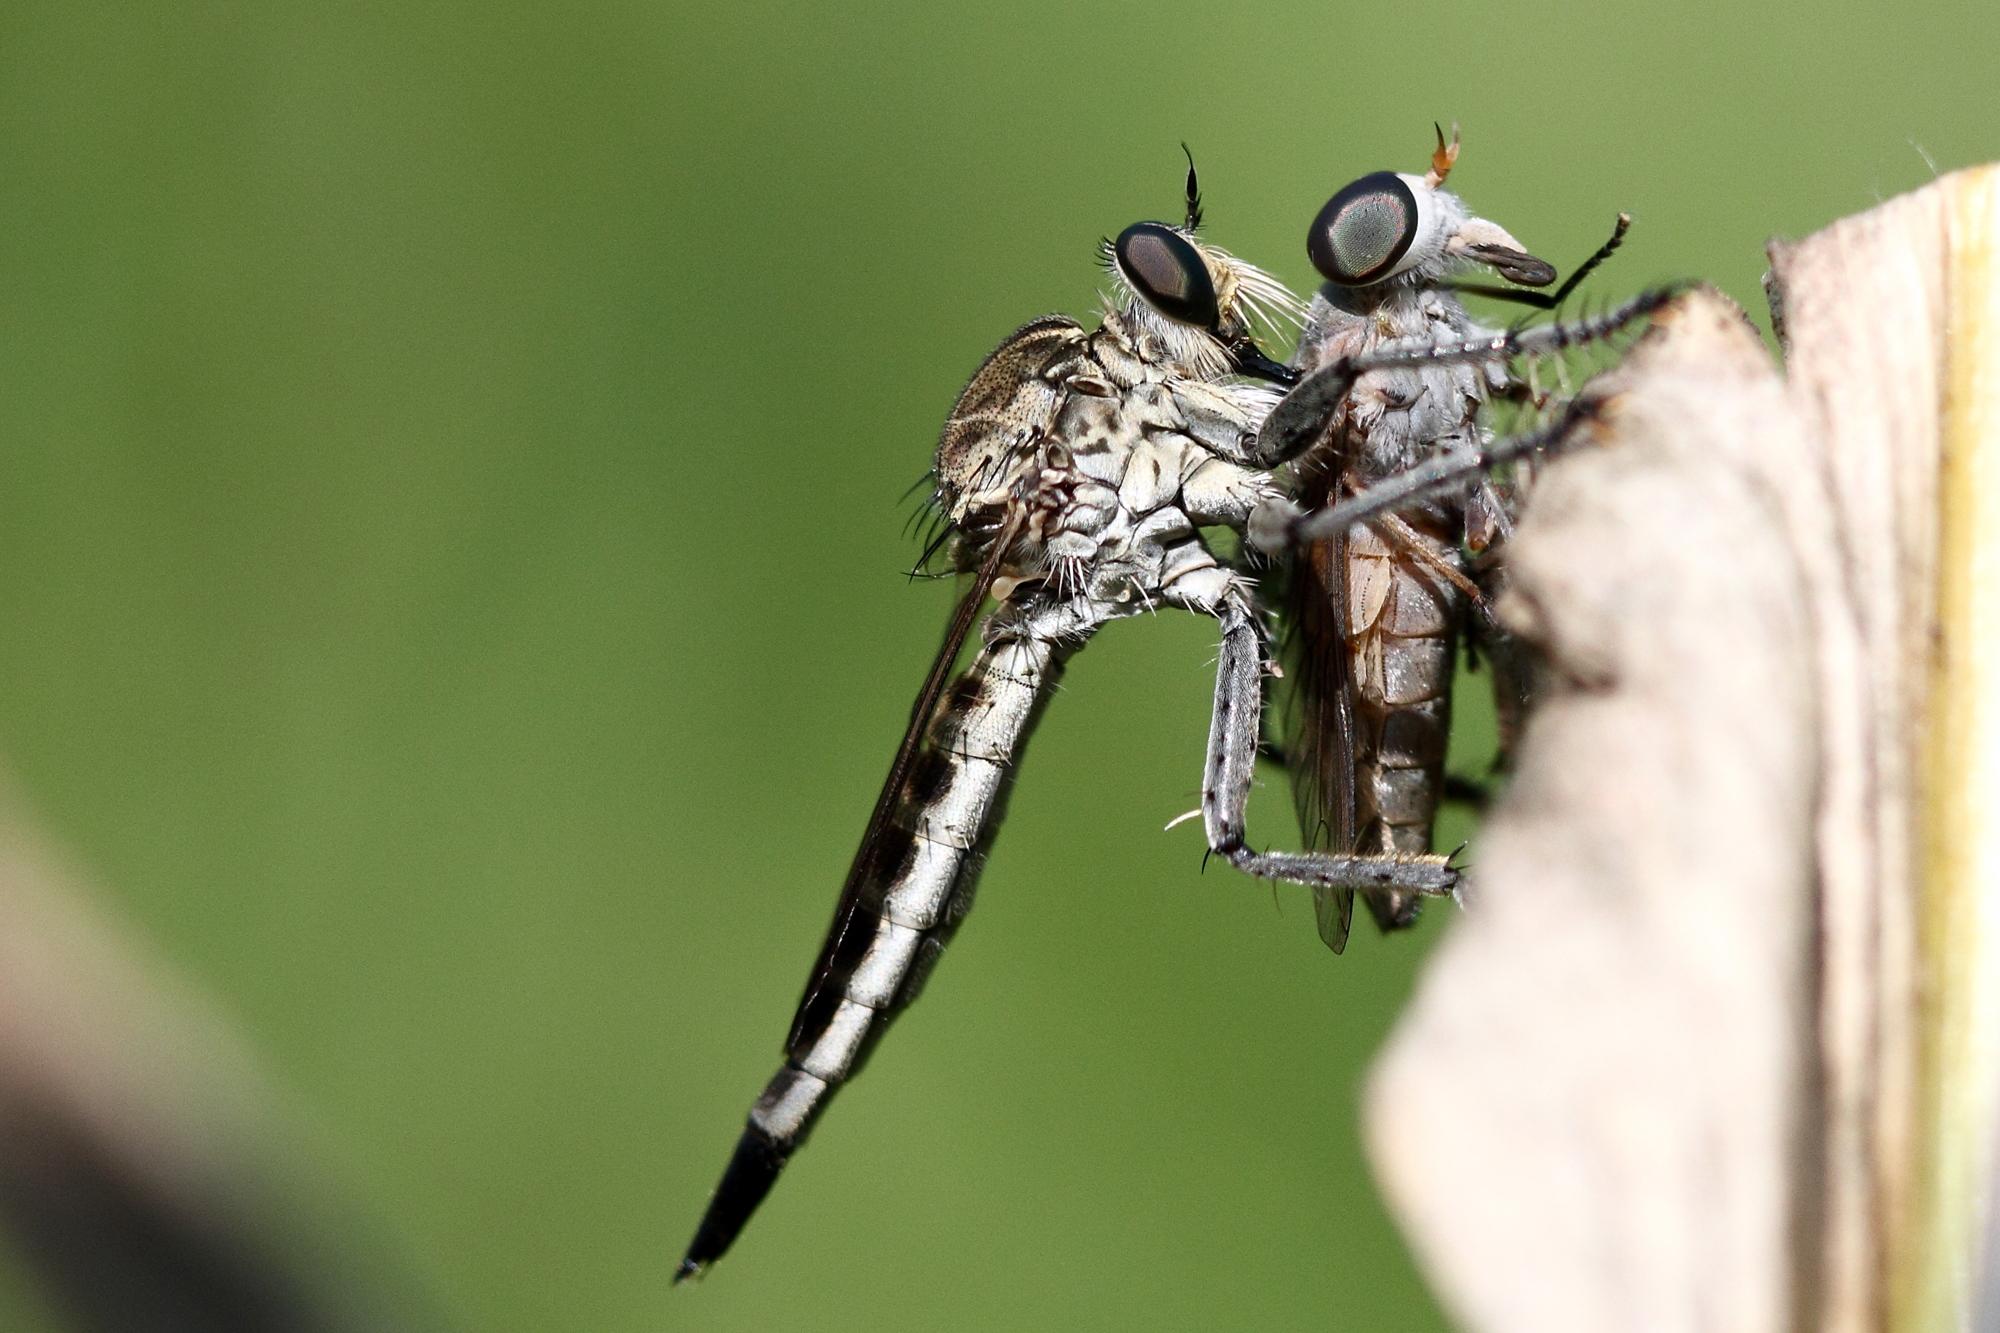 Mating Robberflies